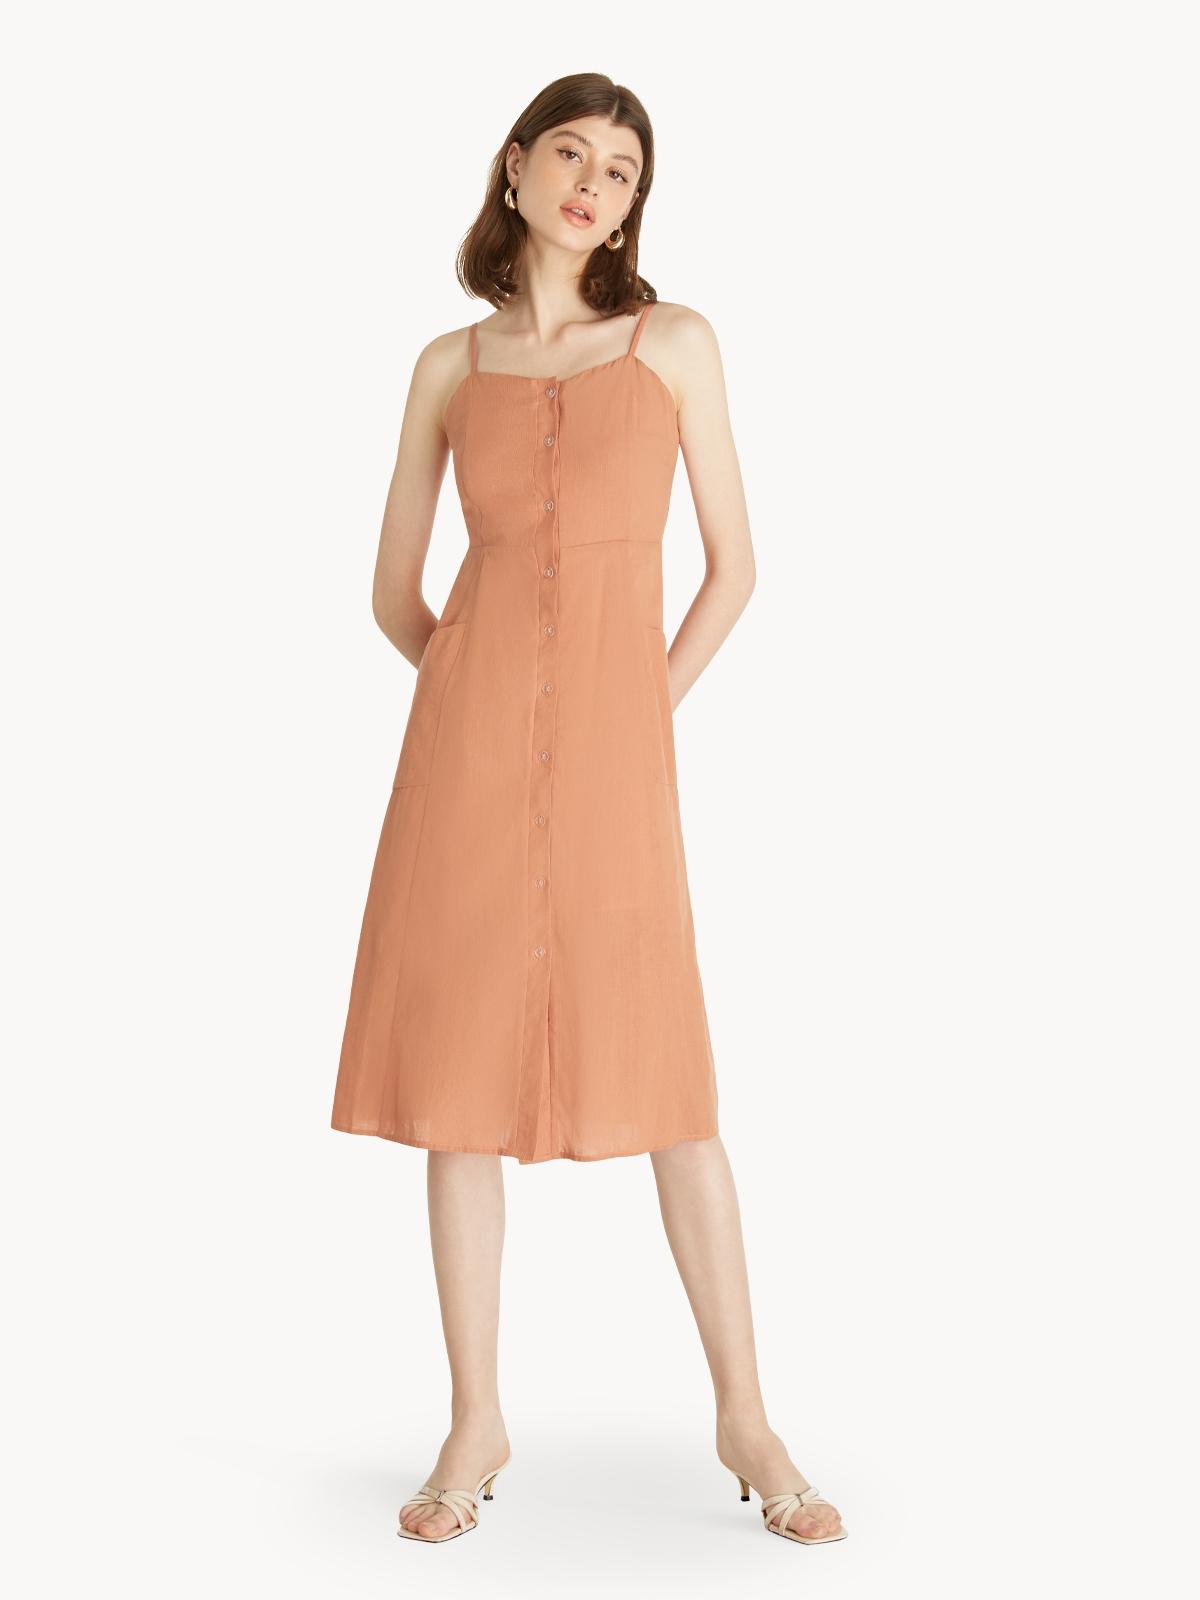 Cami Buttoned Dress Orange